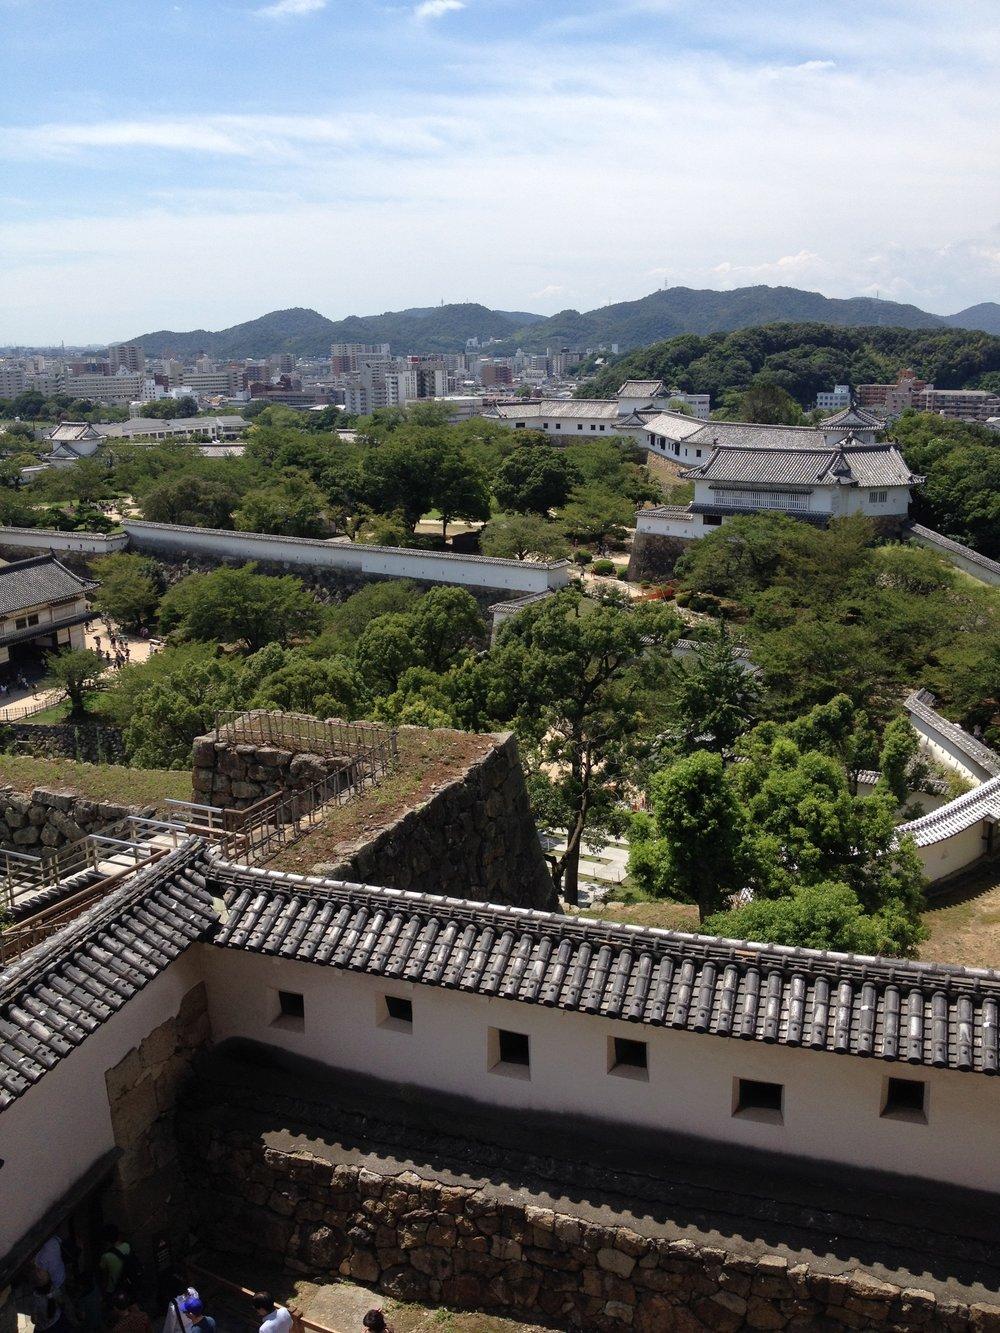 Overlooking Himeji city